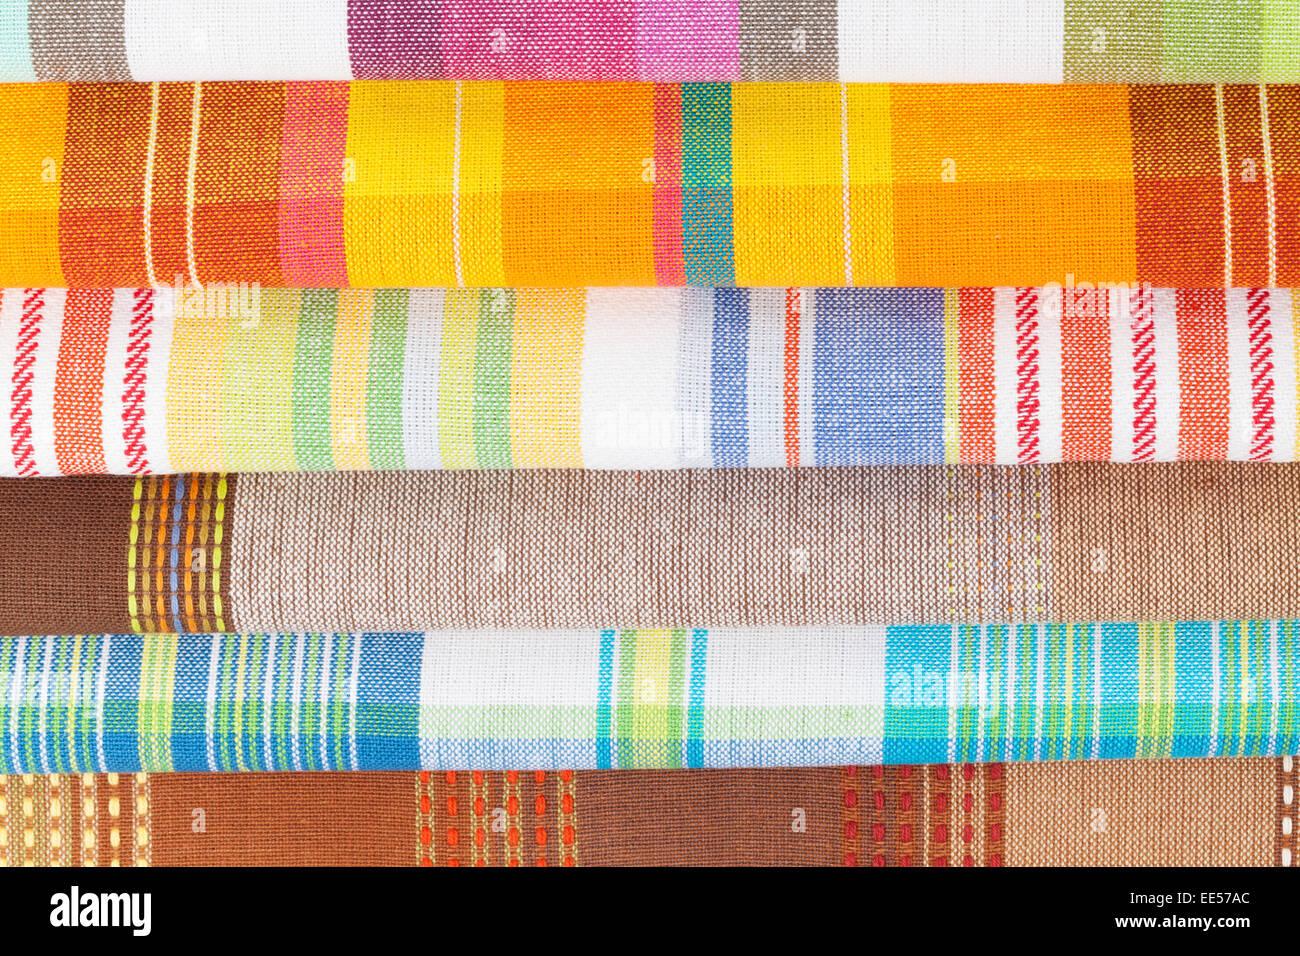 Bunte Kuche Handtucher Closeup Textur Stockfoto Bild 77562196 Alamy